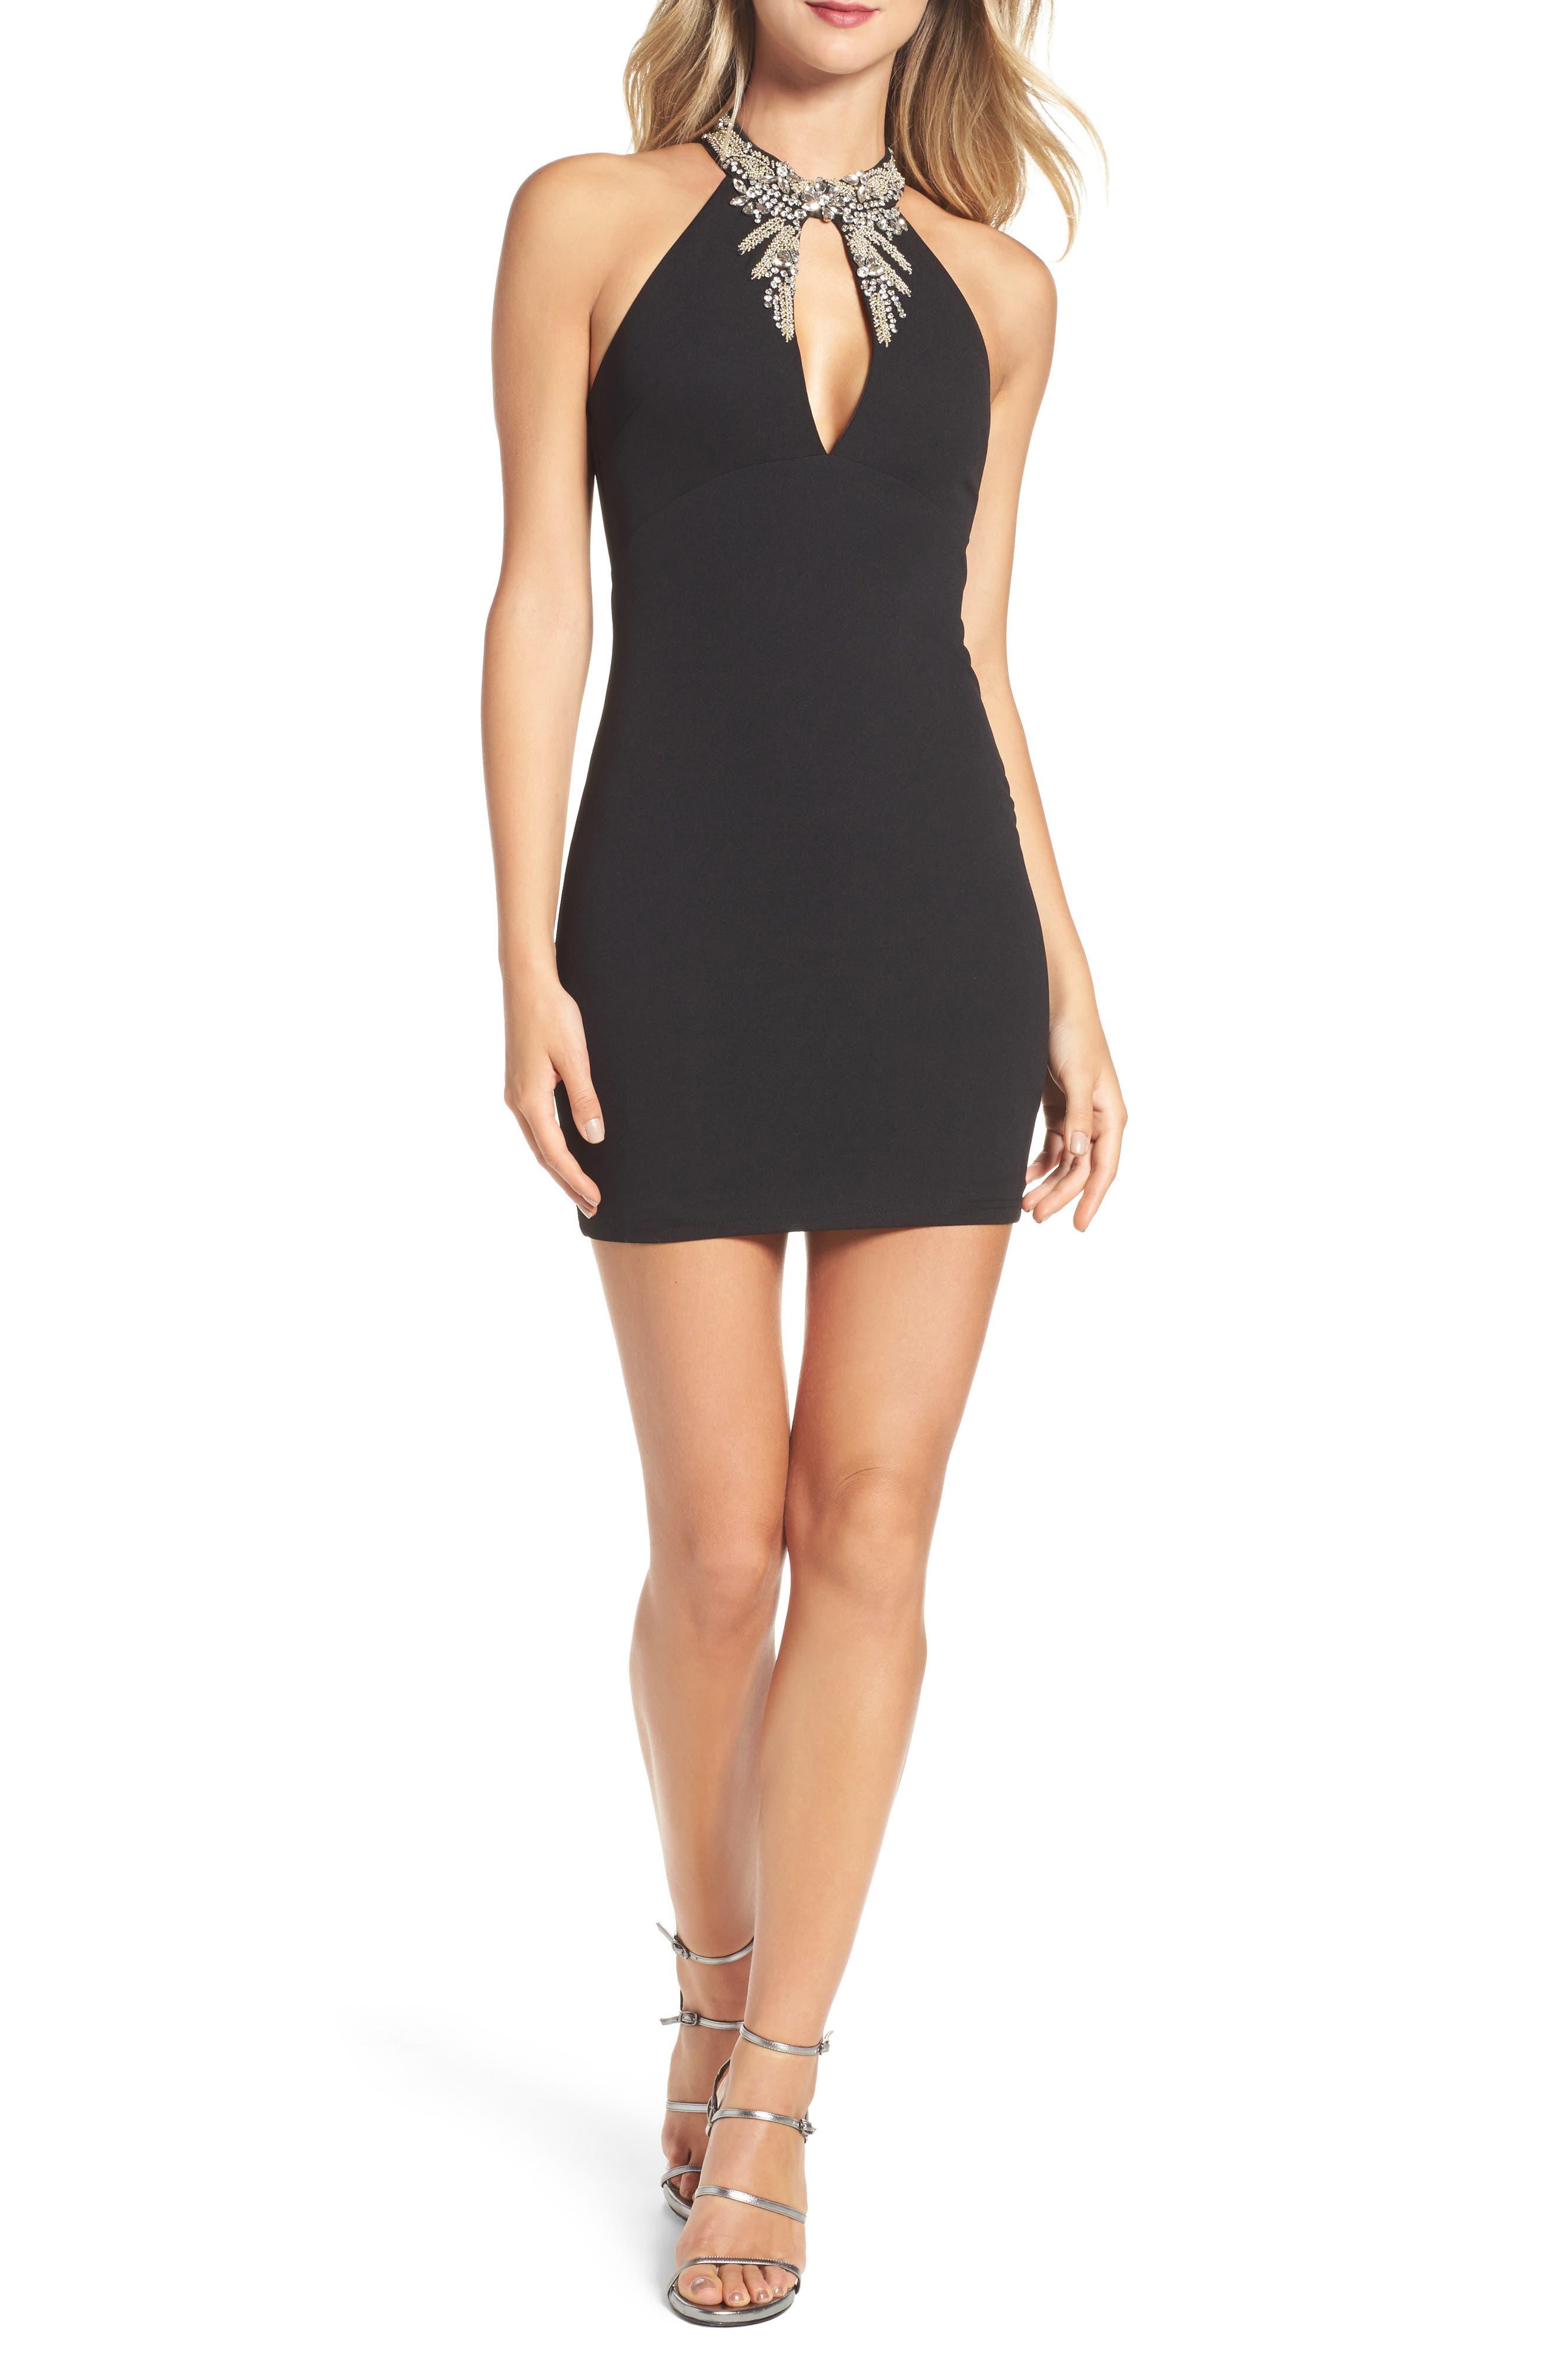 Lulus Alluring Evening Beaded Body-Con Dress